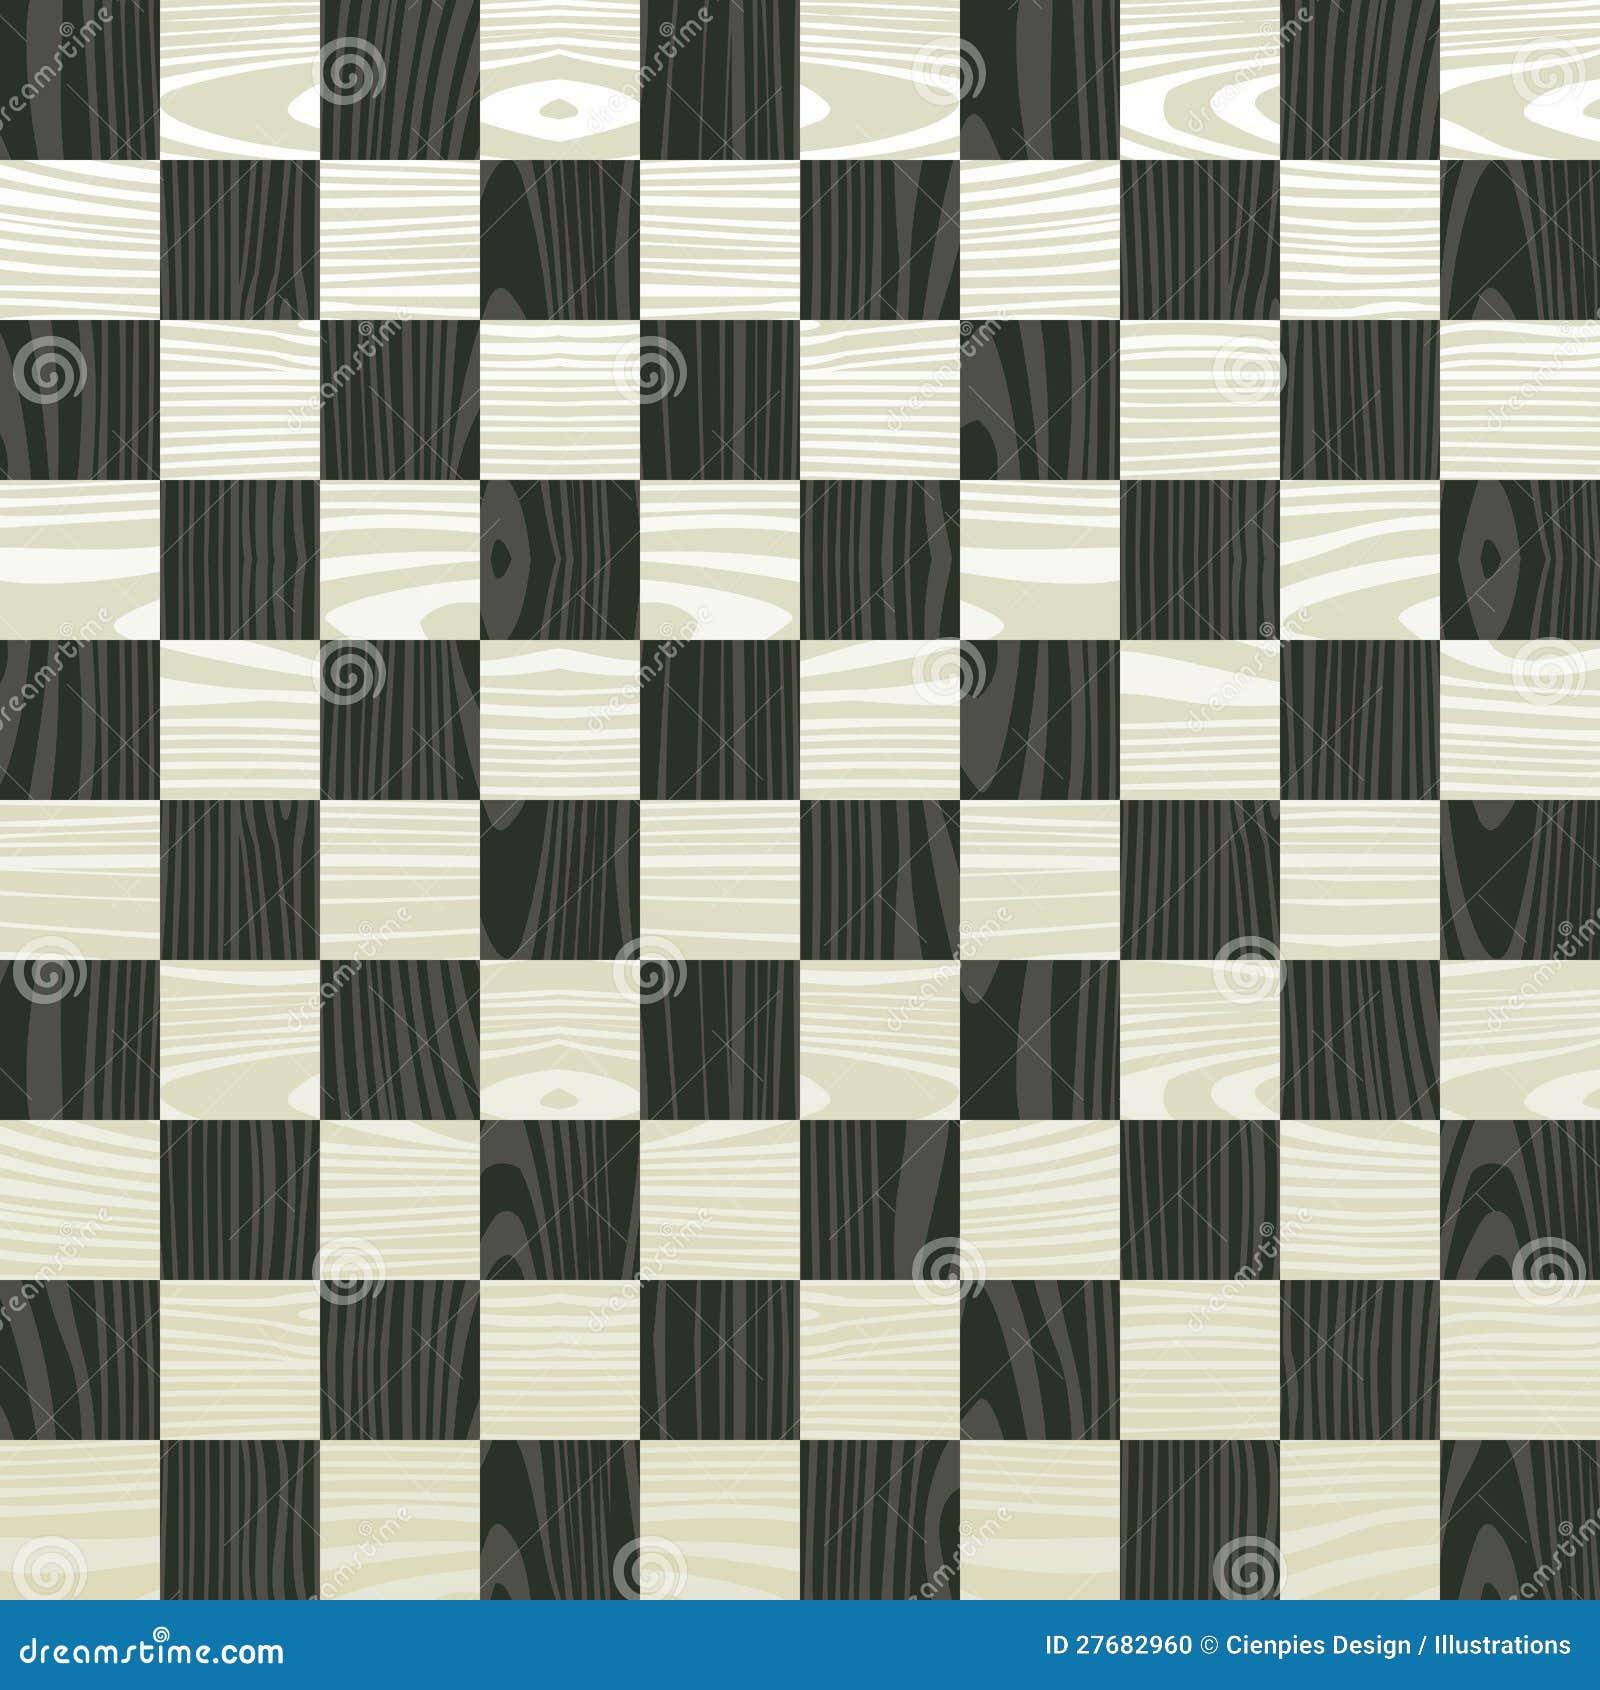 wooden chess board pattern stock photo image 27682960